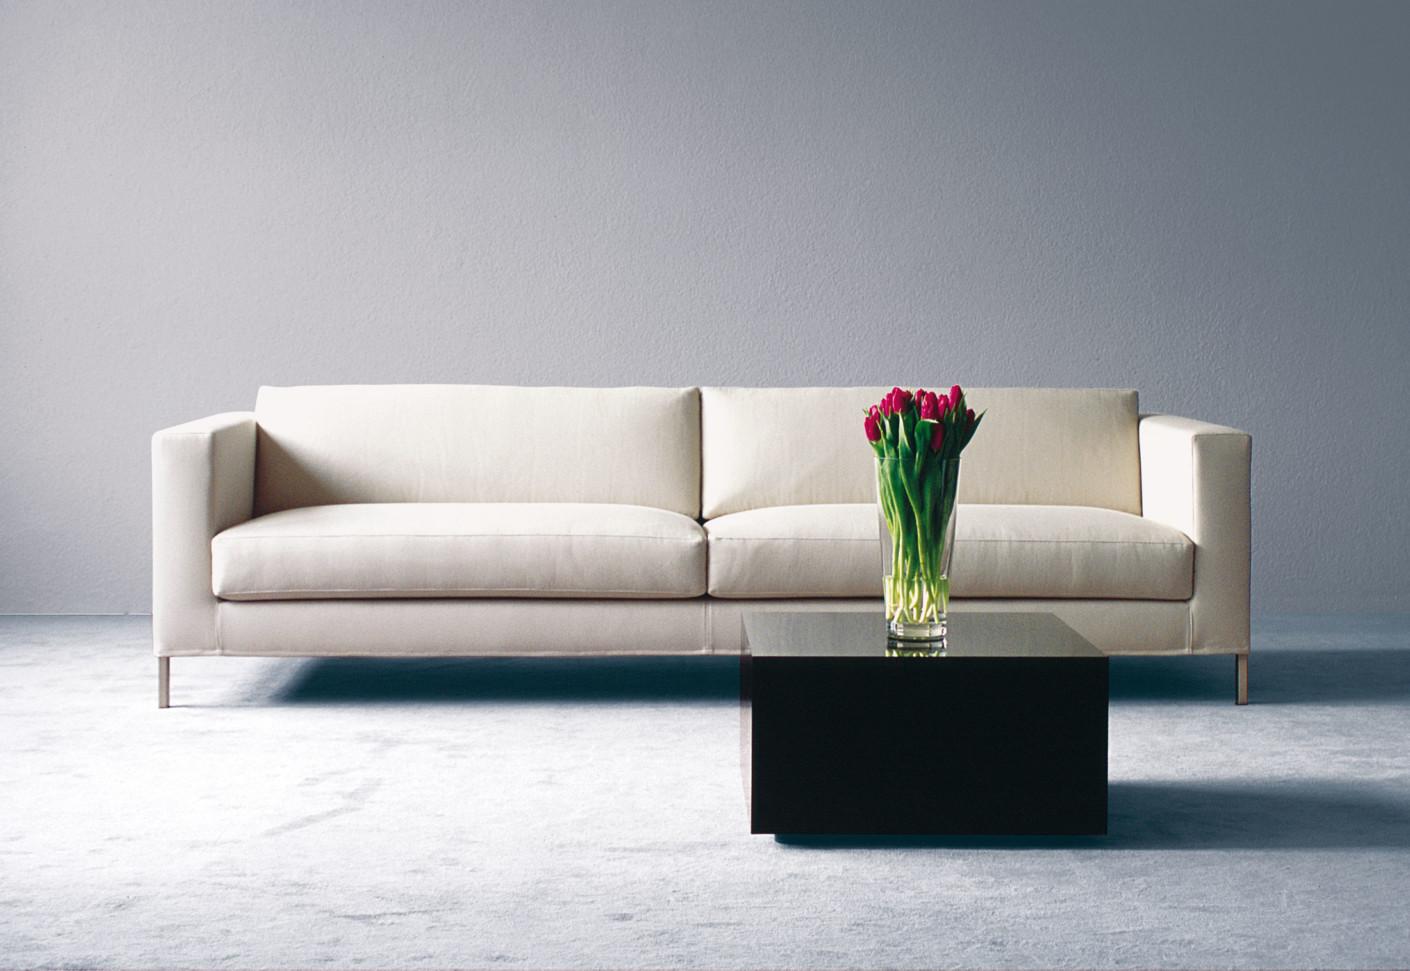 ... world market luxe 3 seat sofa slipcover sofa rp ... - Rp Sleeper Sofa Cover